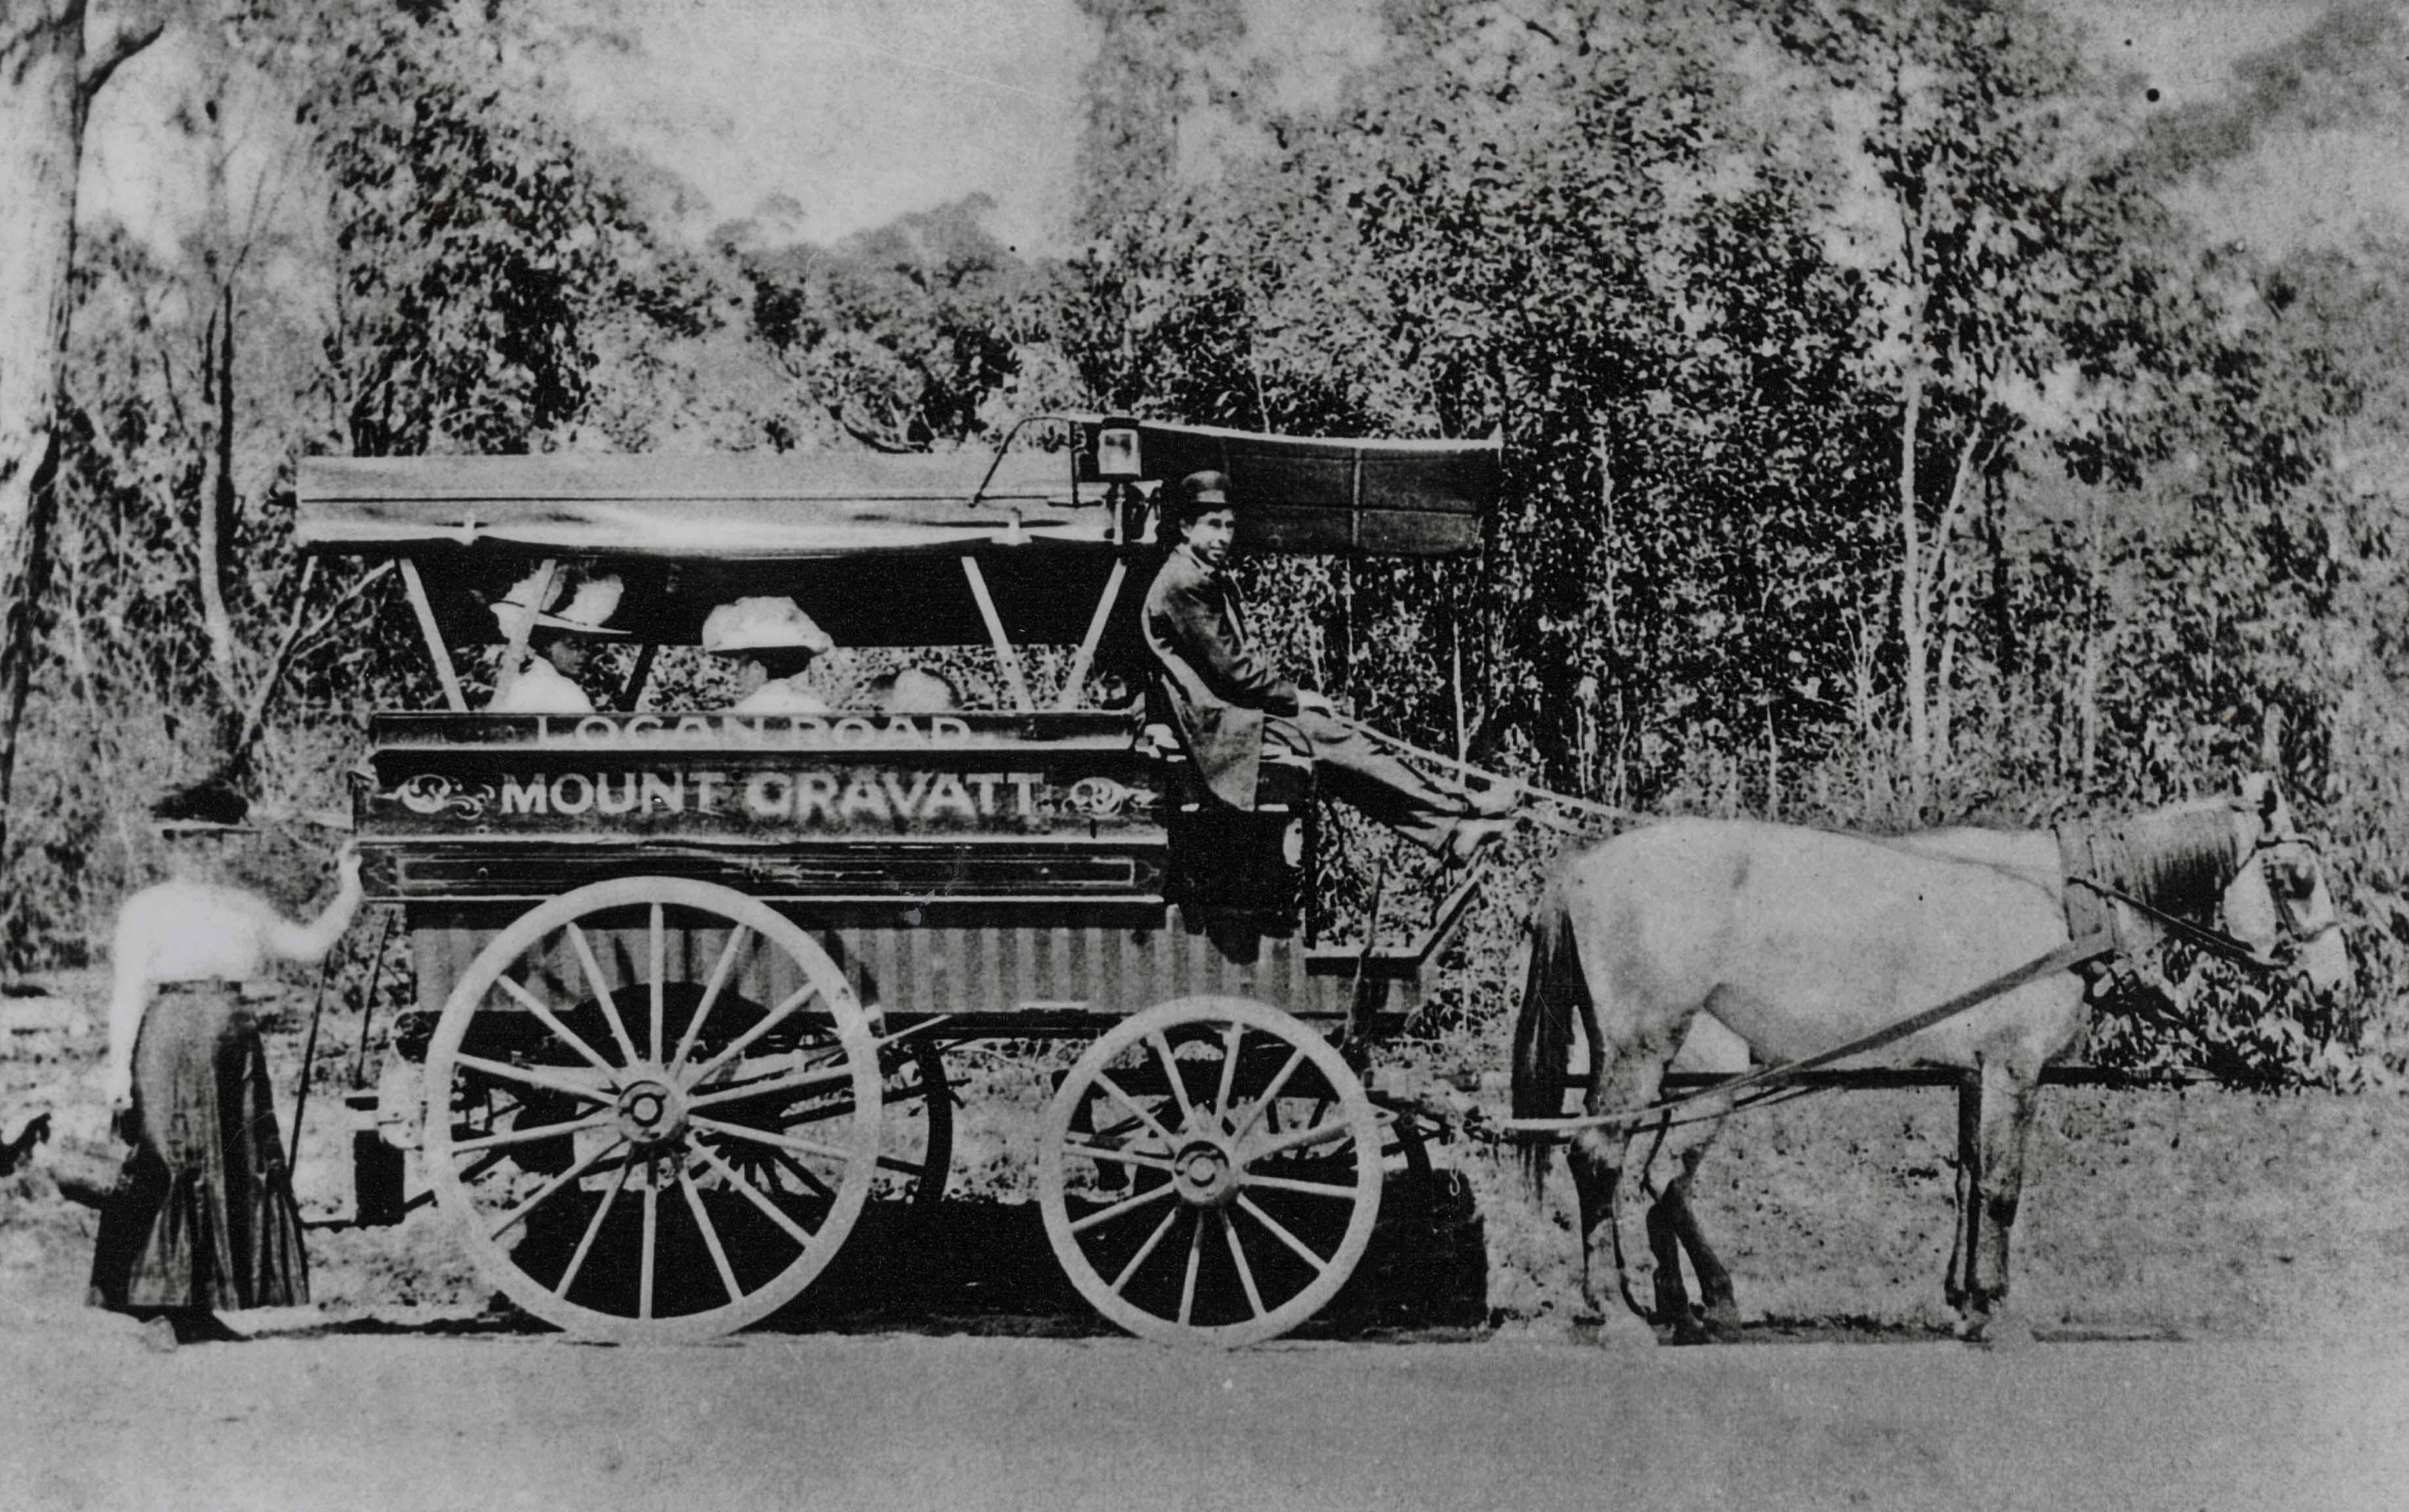 Horse bus transporting passengers at Mount Gravatt slq blog